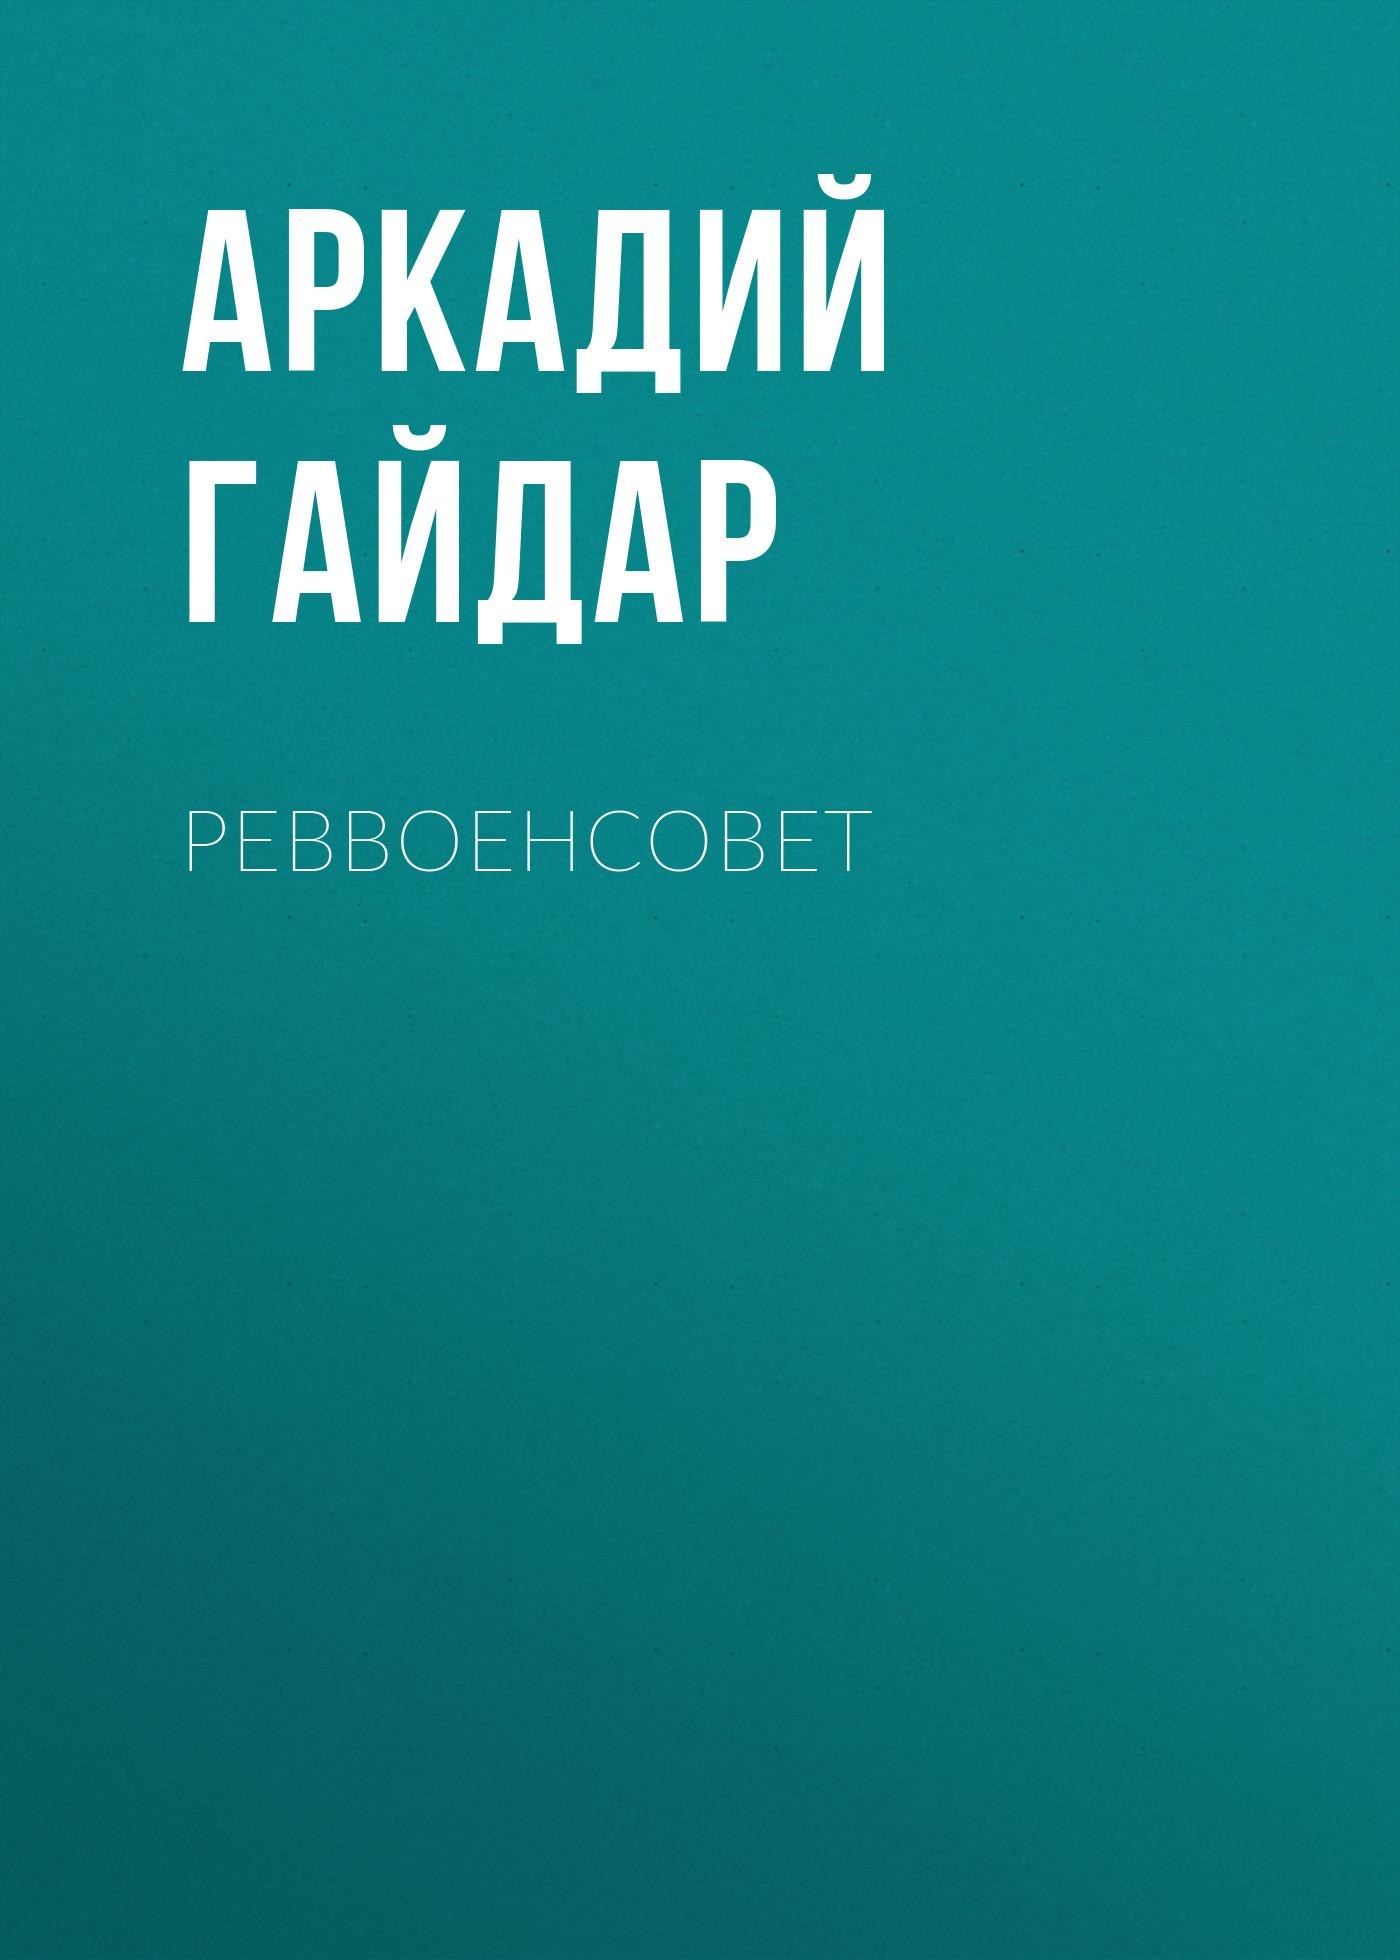 Аркадий Гайдар Реввоенсовет аркадий гайдар избранное